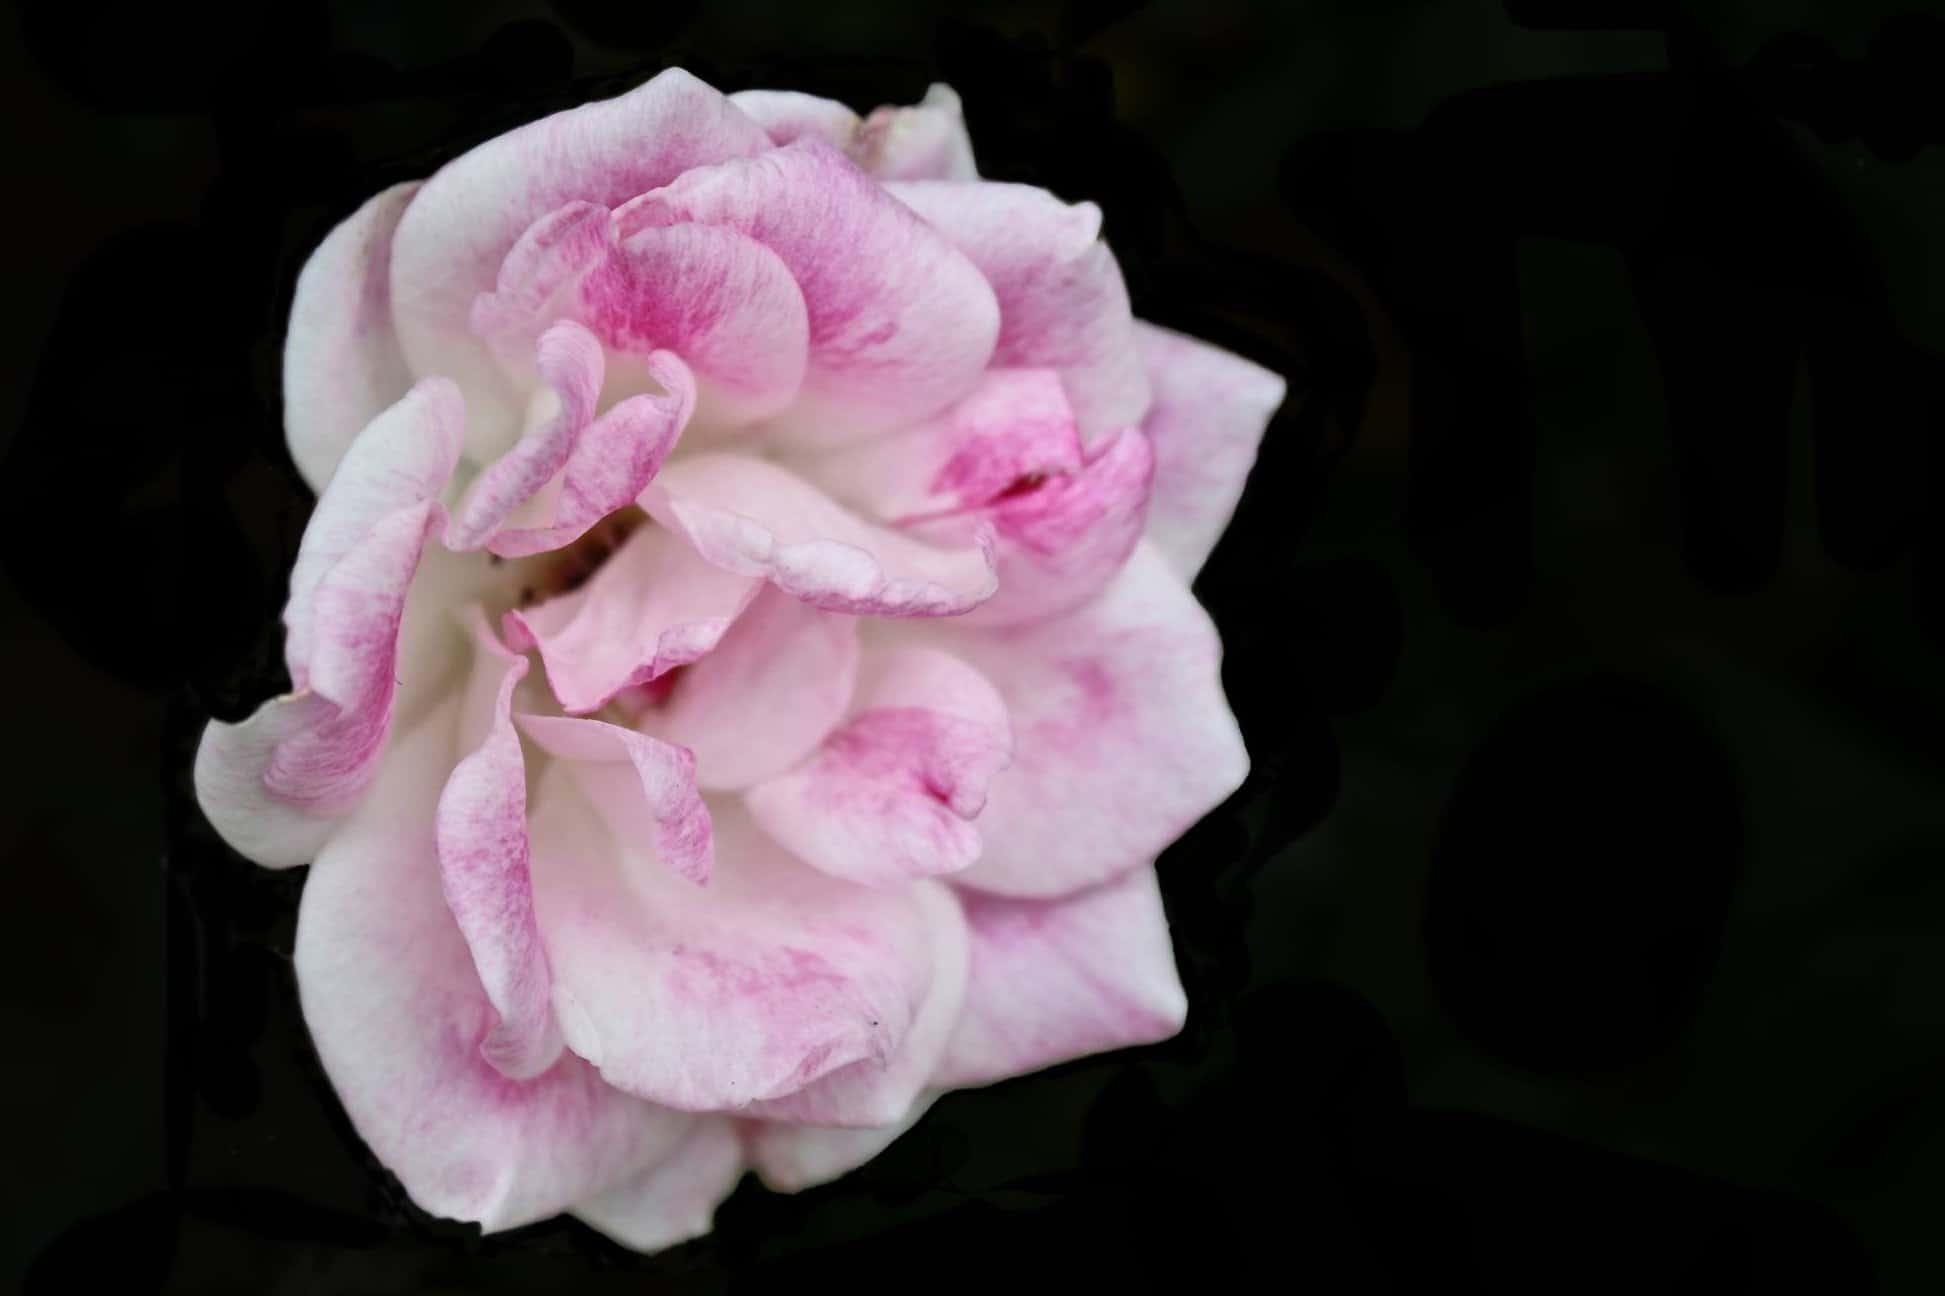 Free Picture Flower Macro Detail Petal Pink Camellia Plant